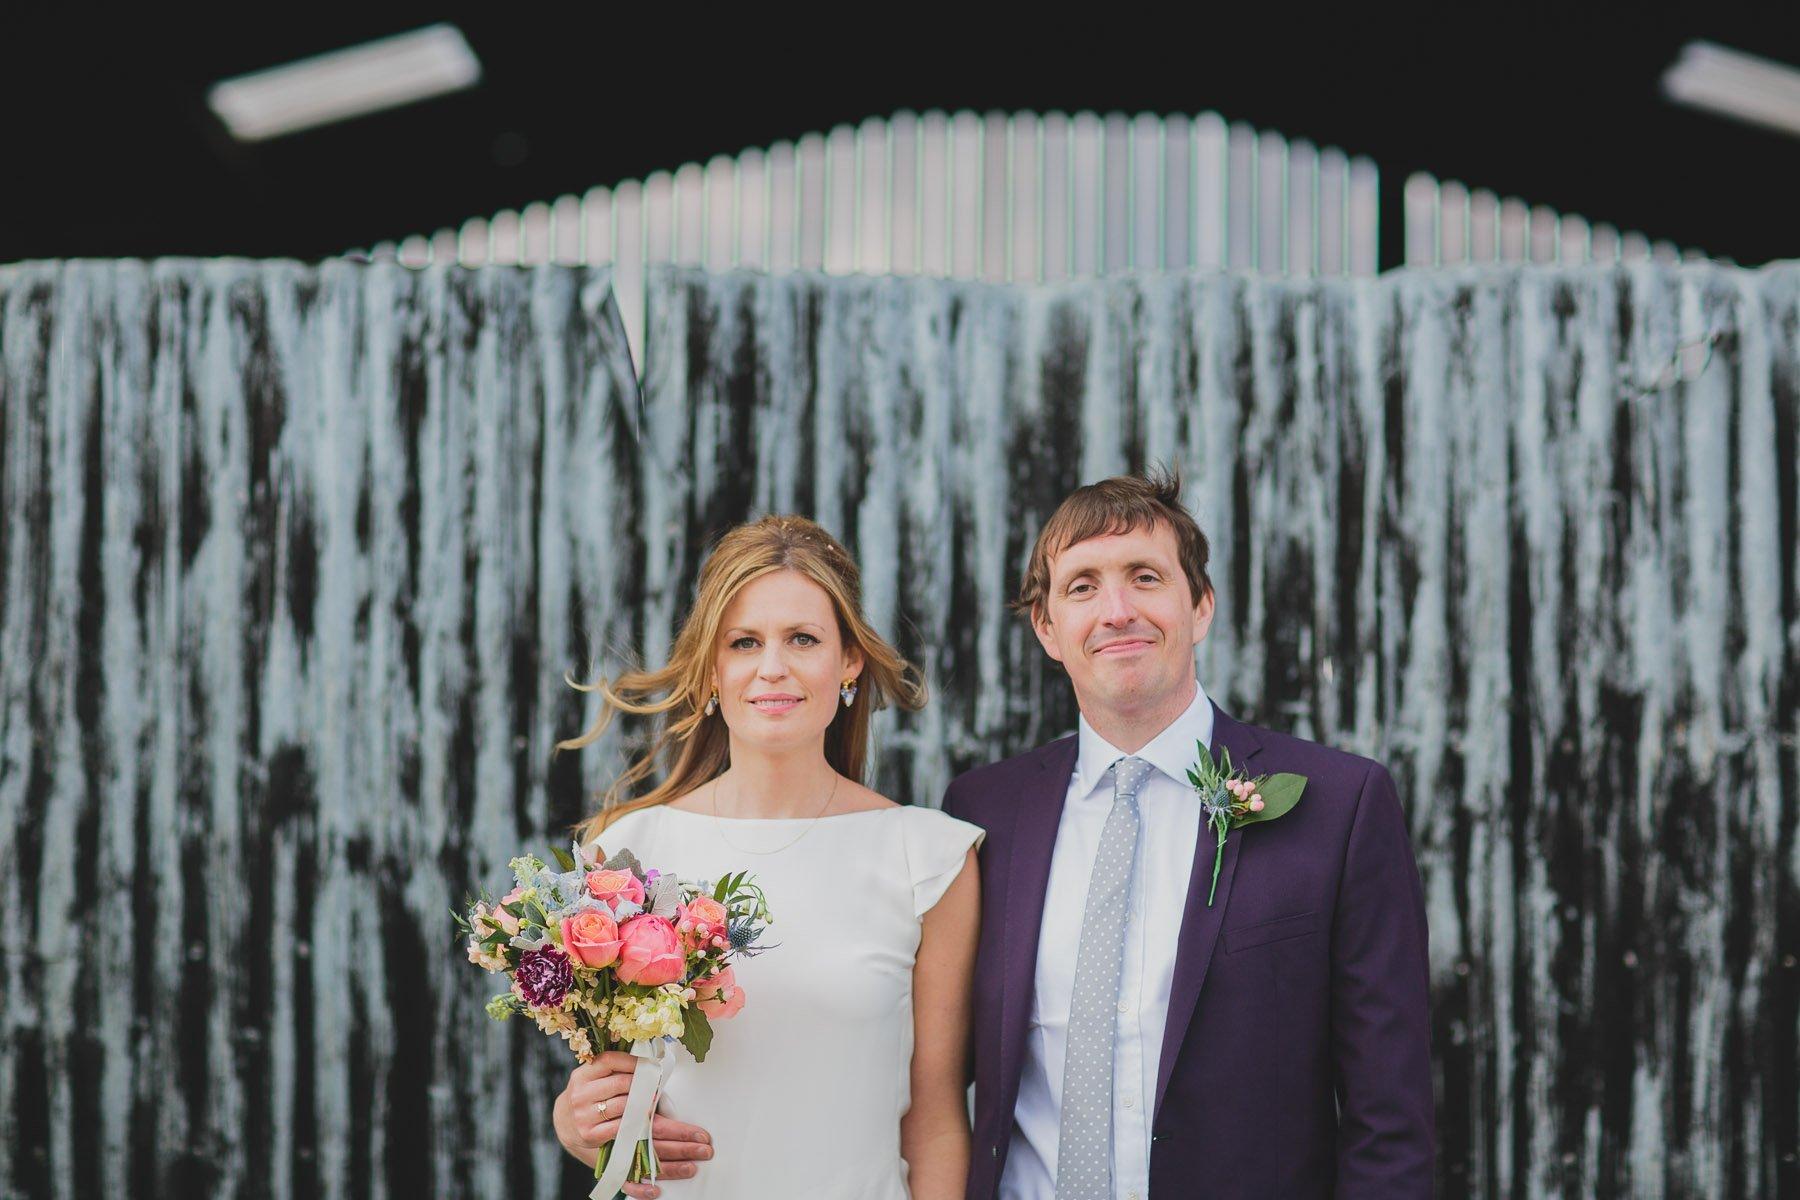 Buckinghamshire-Wedding-Lizzie-Duncan-107